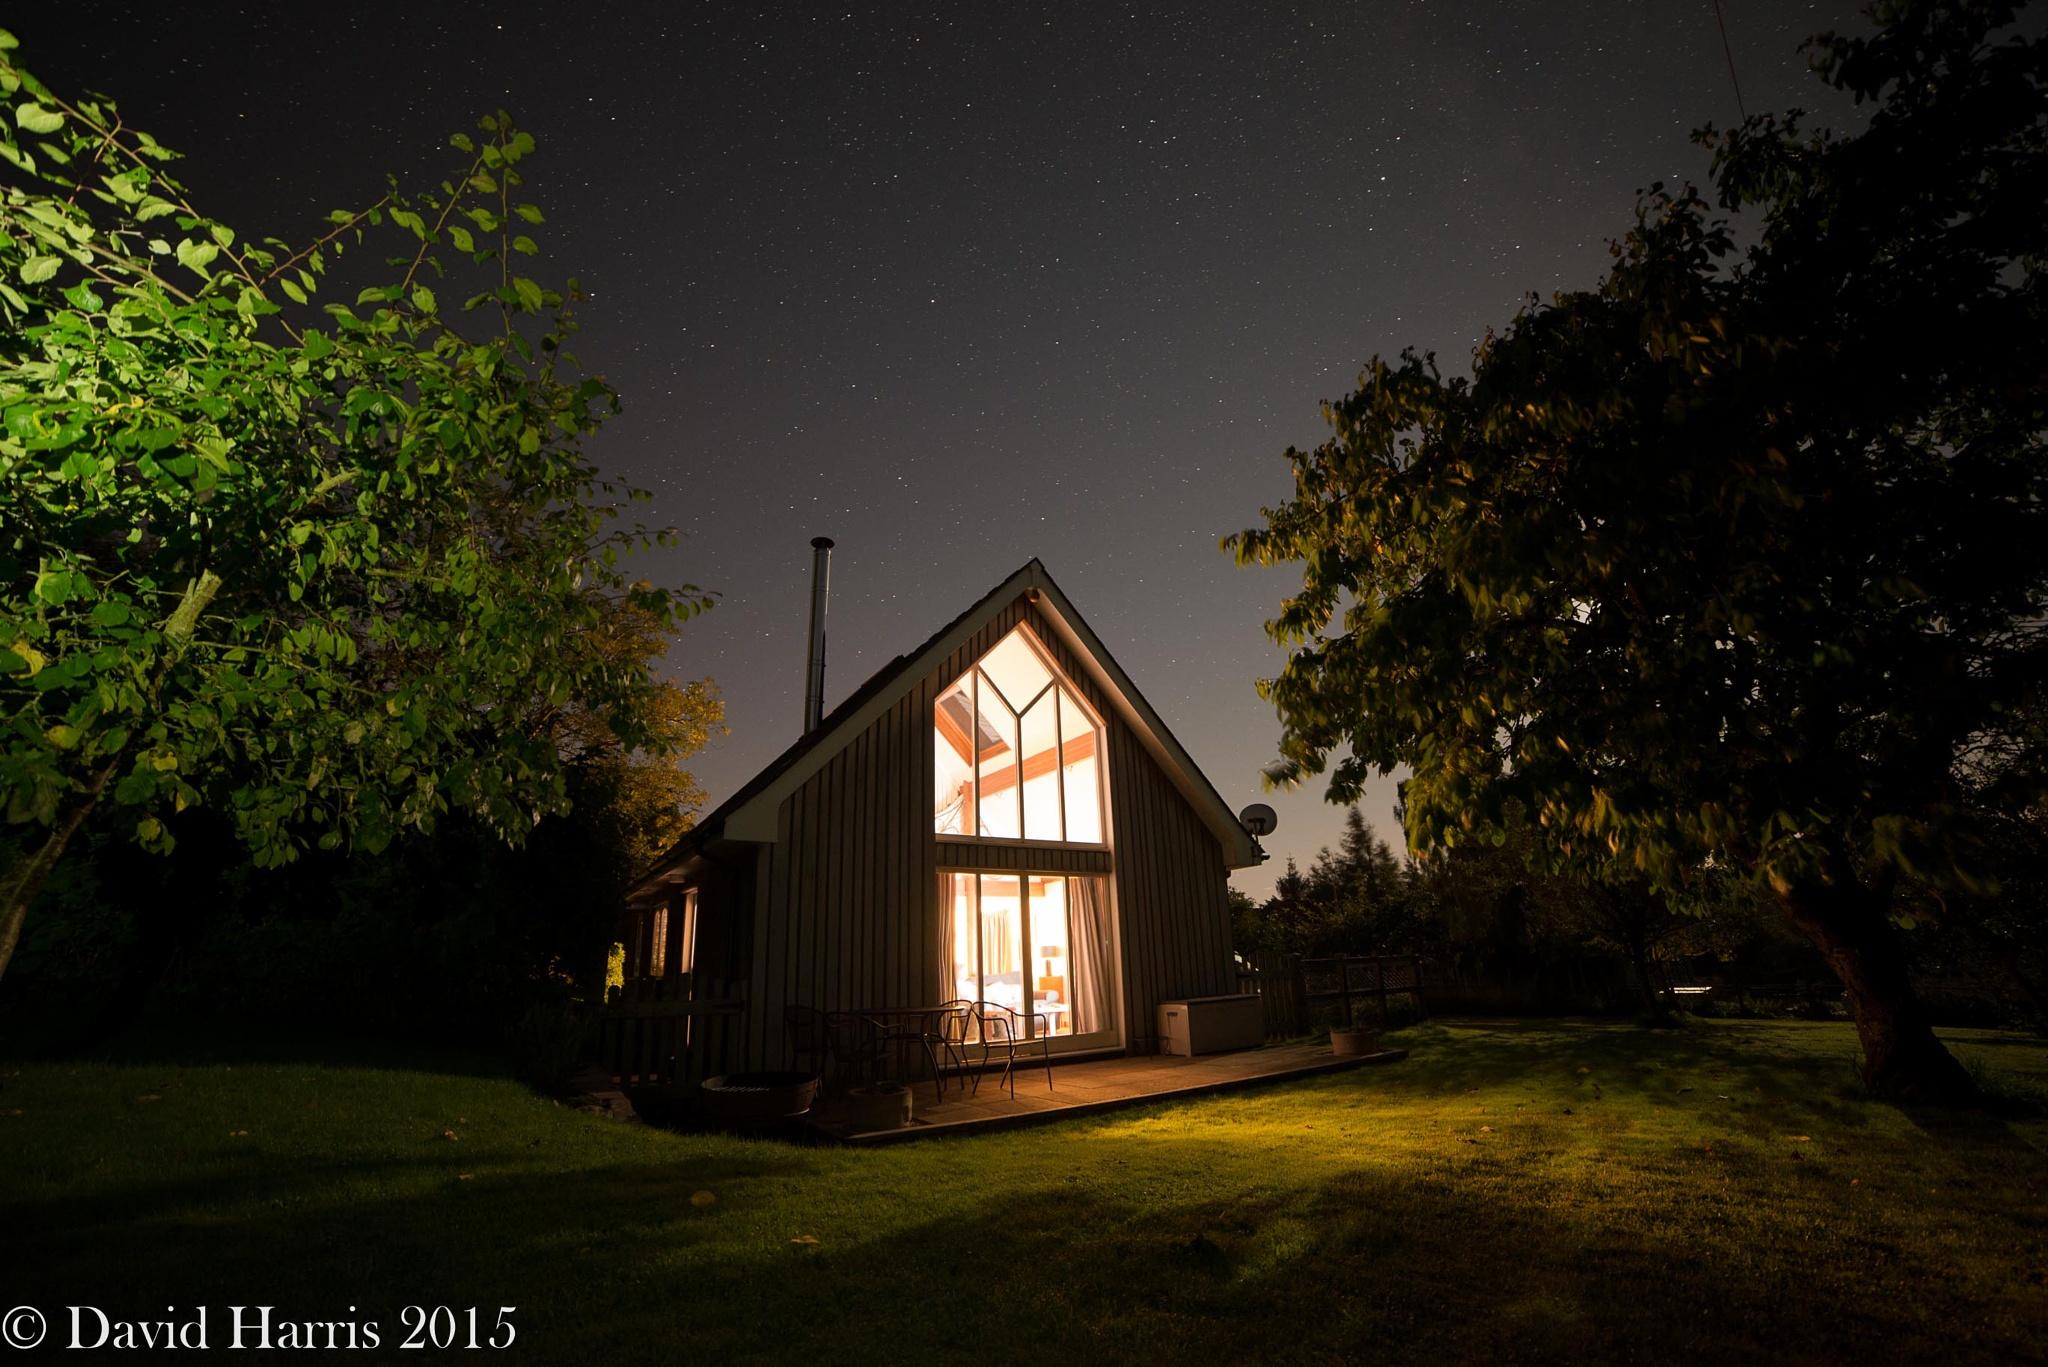 Hodson's House by David Harris